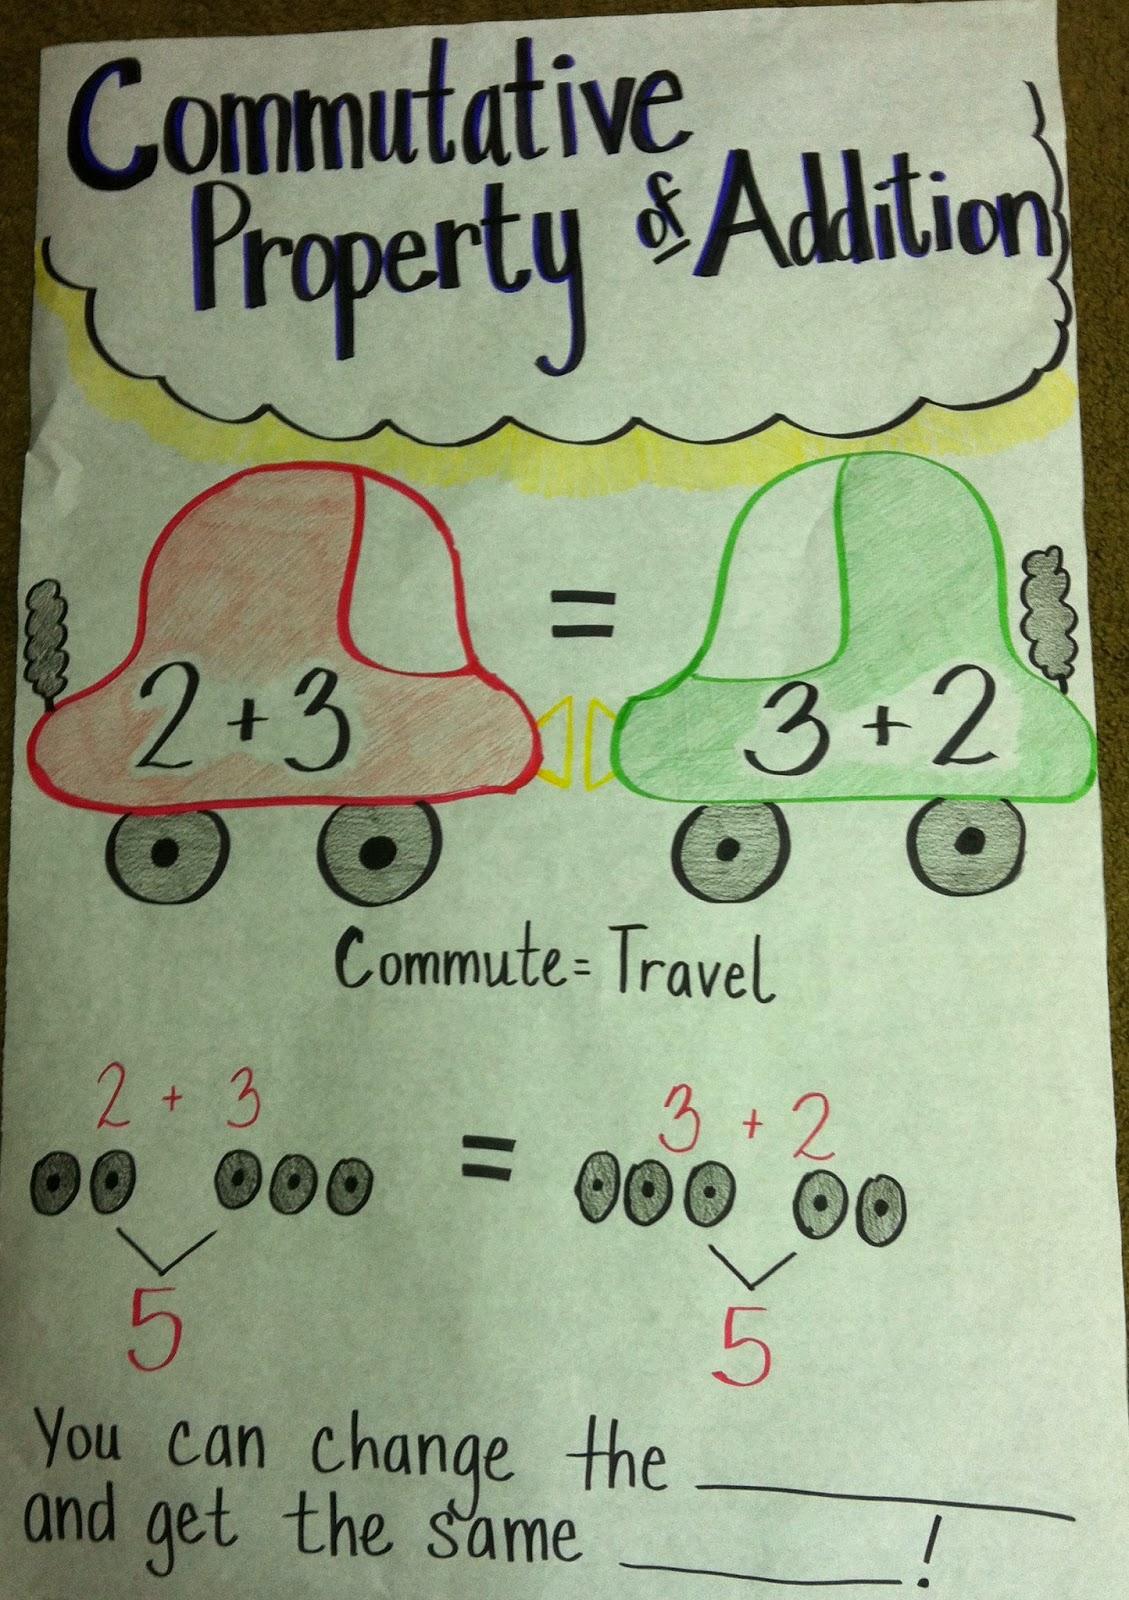 Image Result For Commutative Property Multiplication Anchor Chart